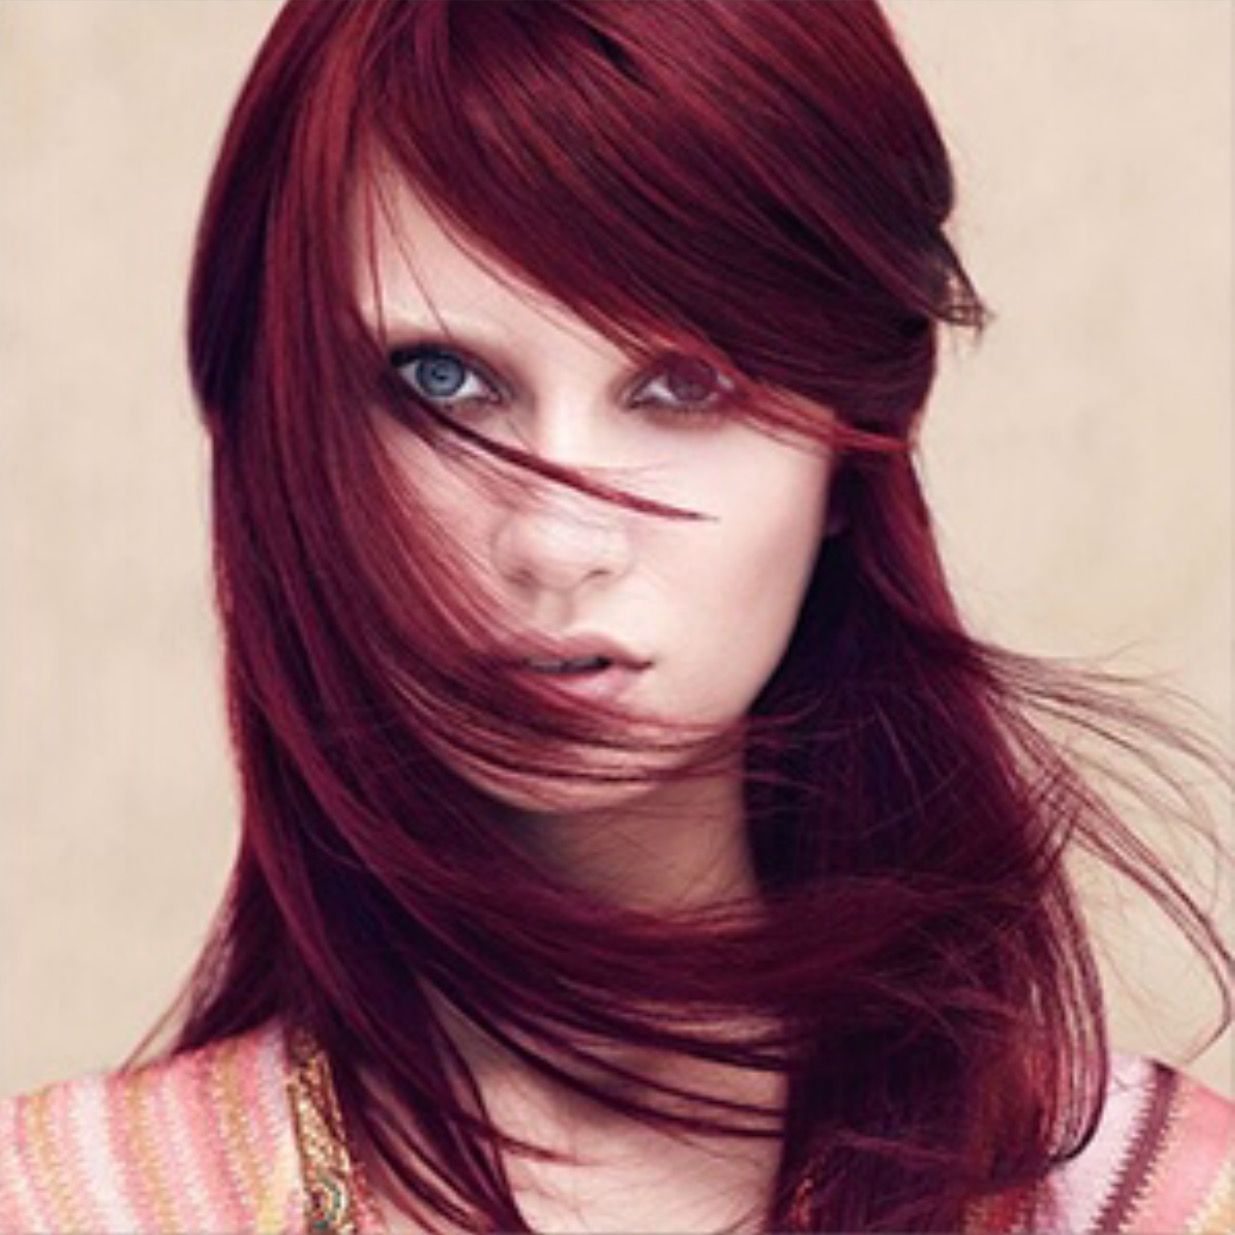 Pin By Tammy Manrique On Hair Stuff Pinterest